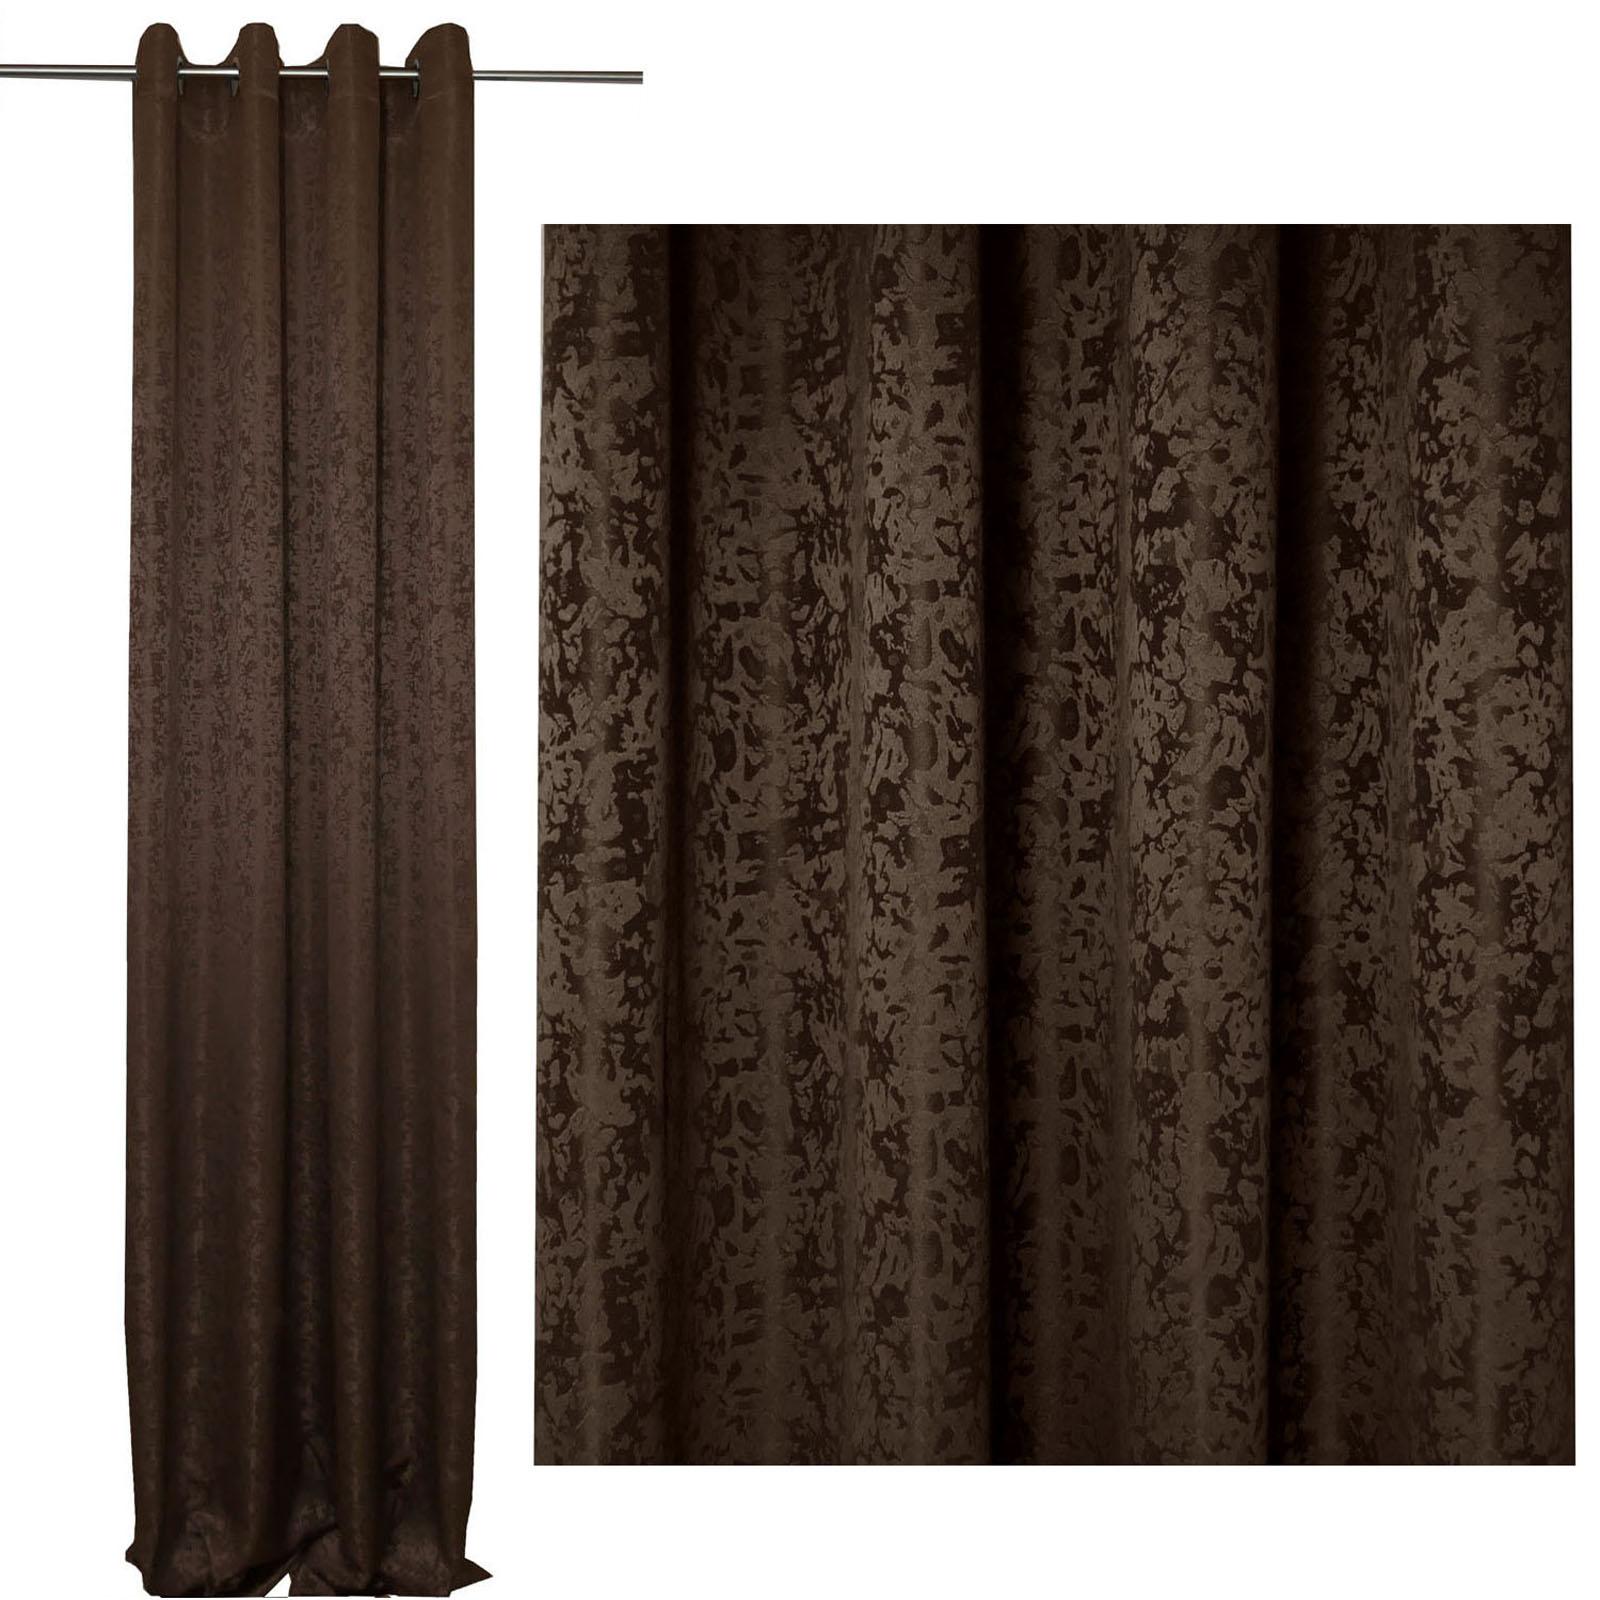 vorhang marmoriert Ösen 140 x 245 cm blickdicht gardine dekoschal, Badezimmer ideen